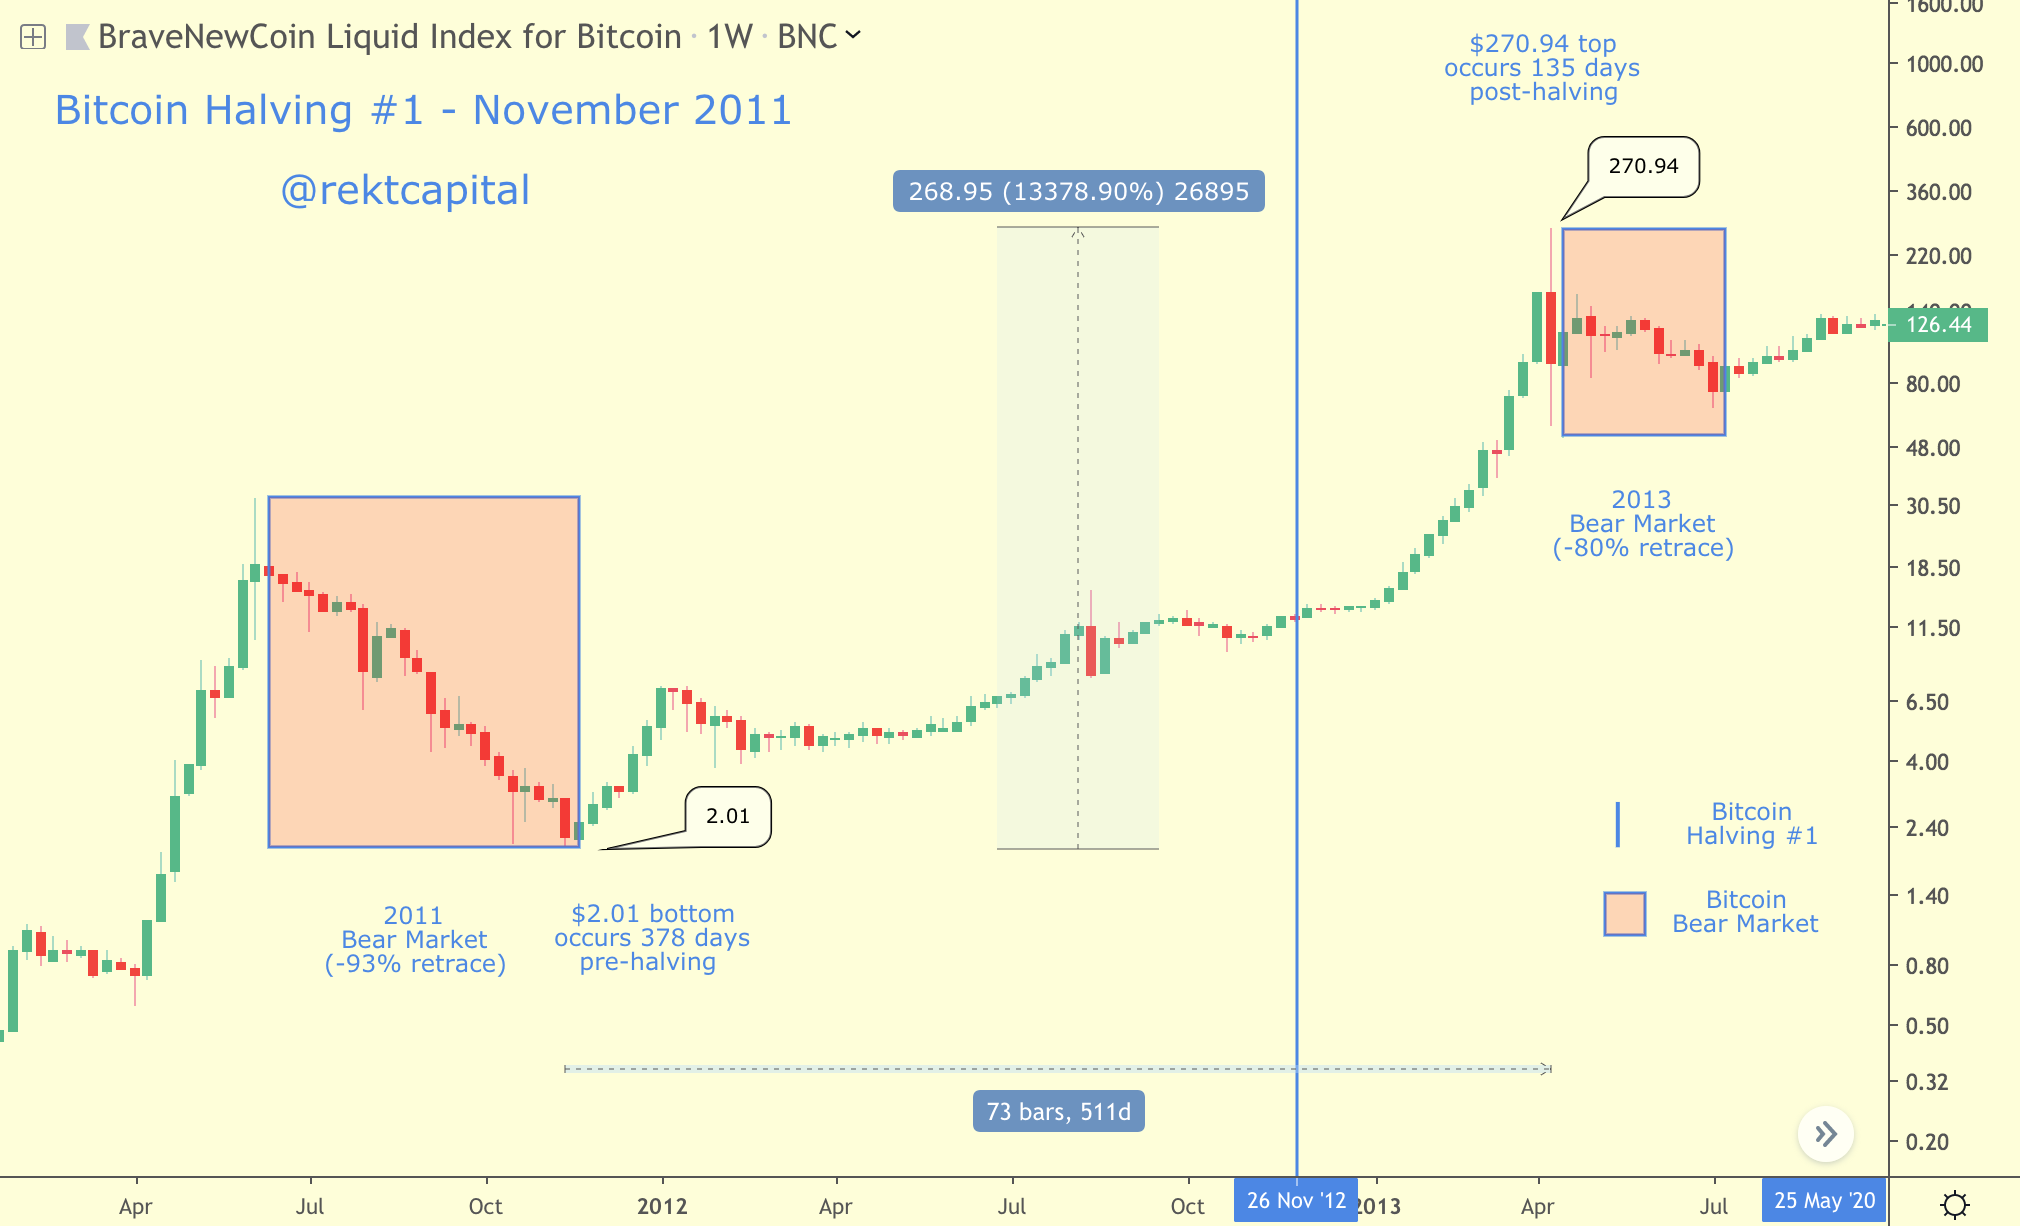 Bitcoin Halving 1